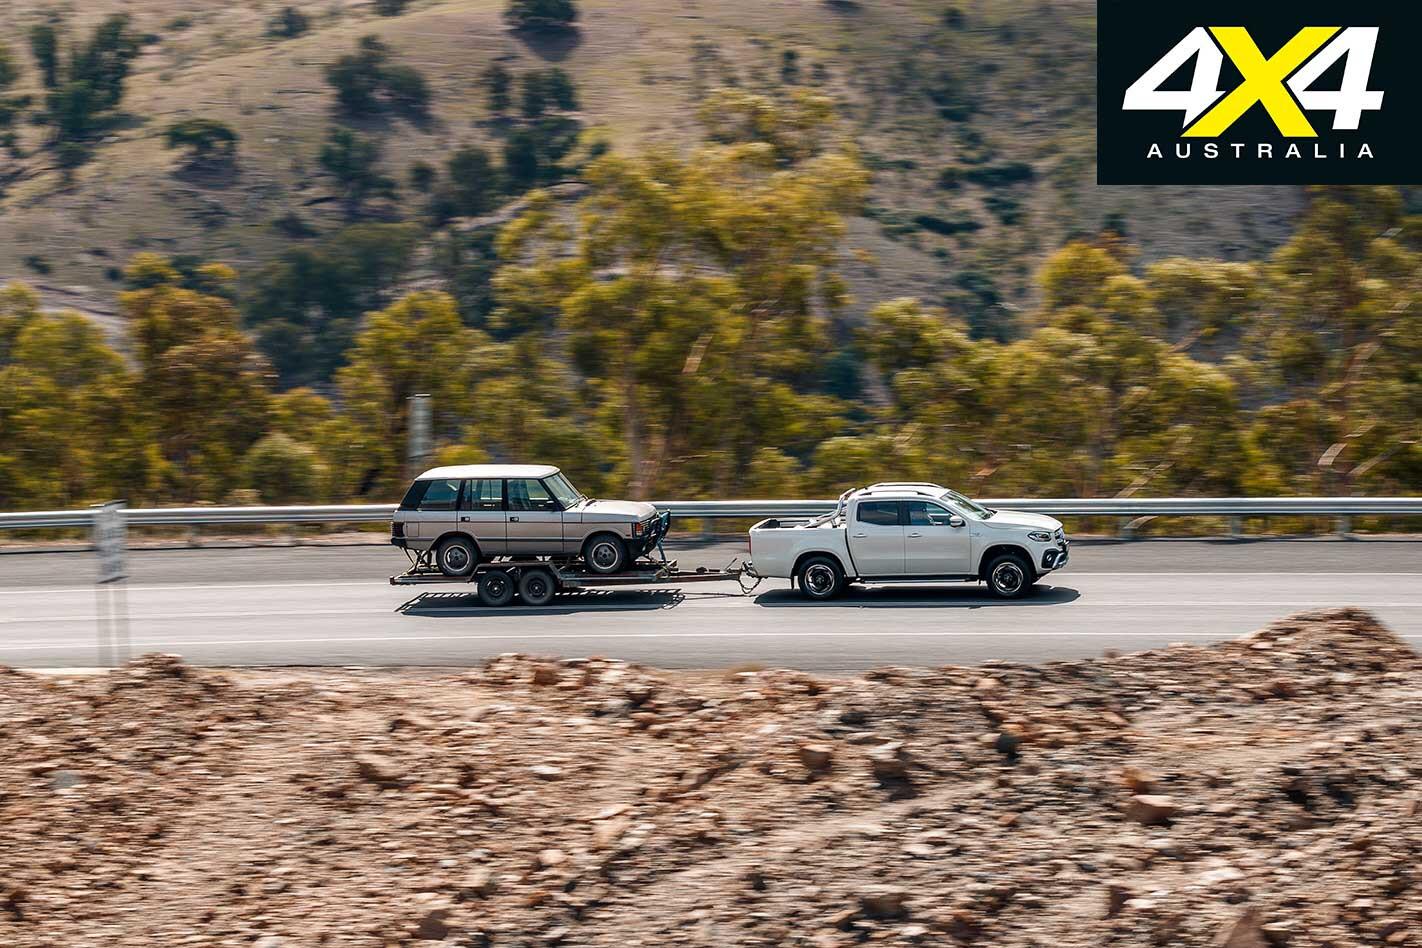 2019 Mercedes Benz X 350 D Steep Gradient Tow Testing Jpg